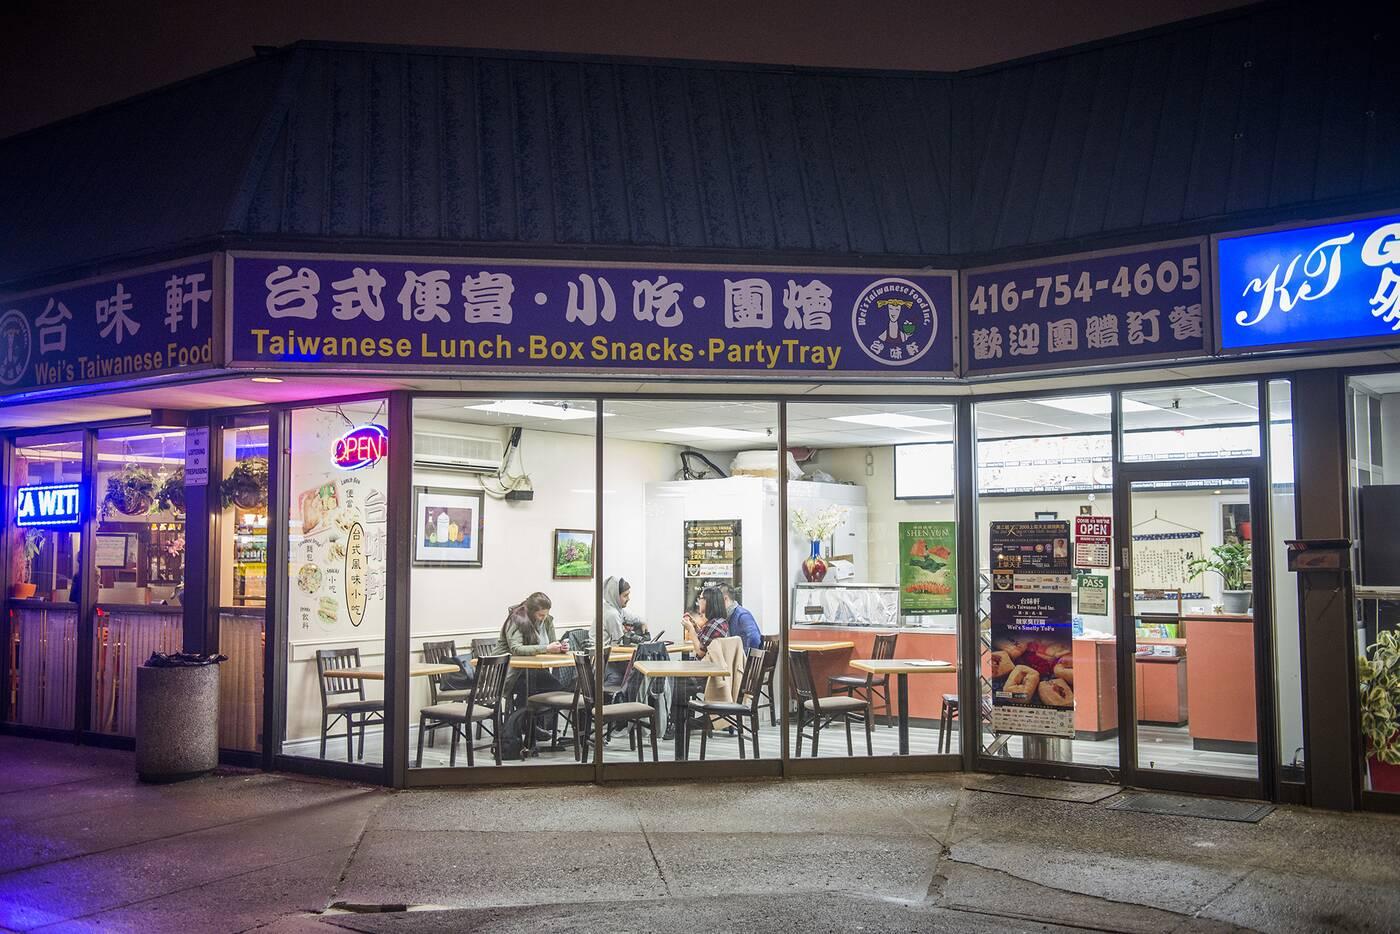 weis Taiwanese